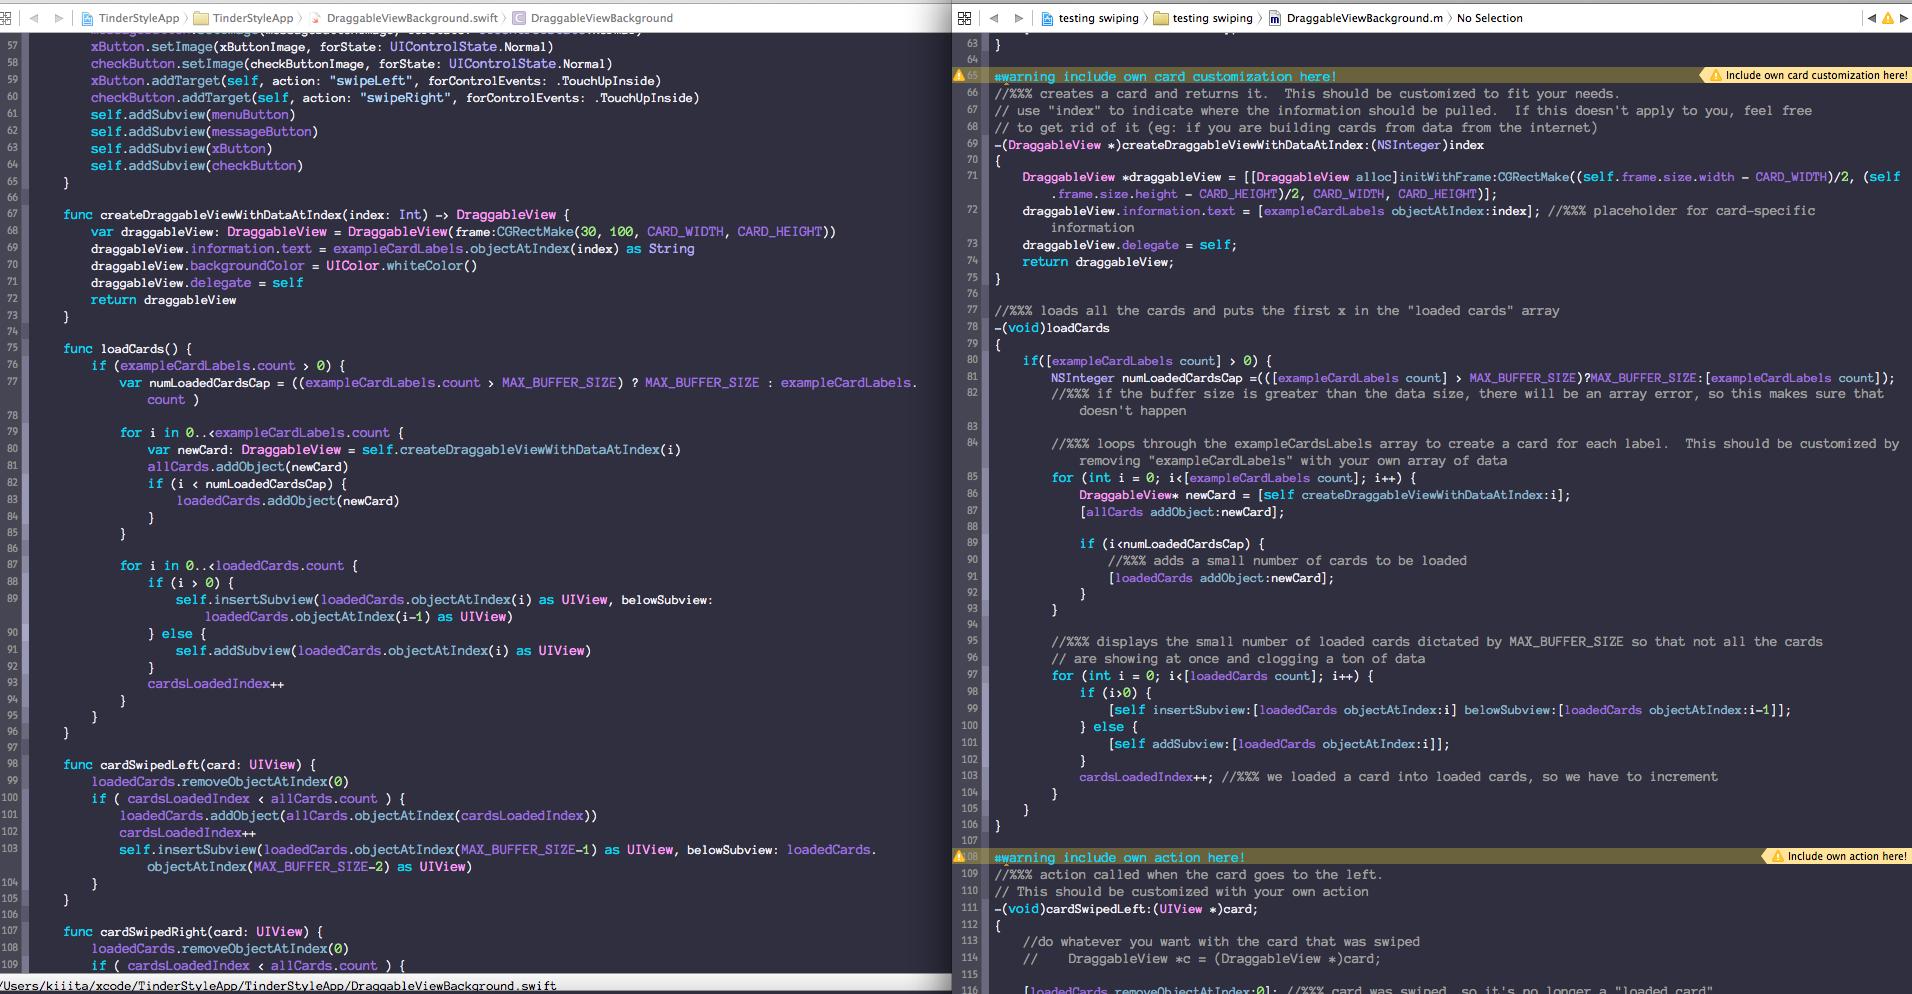 SwiftでTinderUIを実装してみた(Swift, Xcode6 beta5) - Qiita